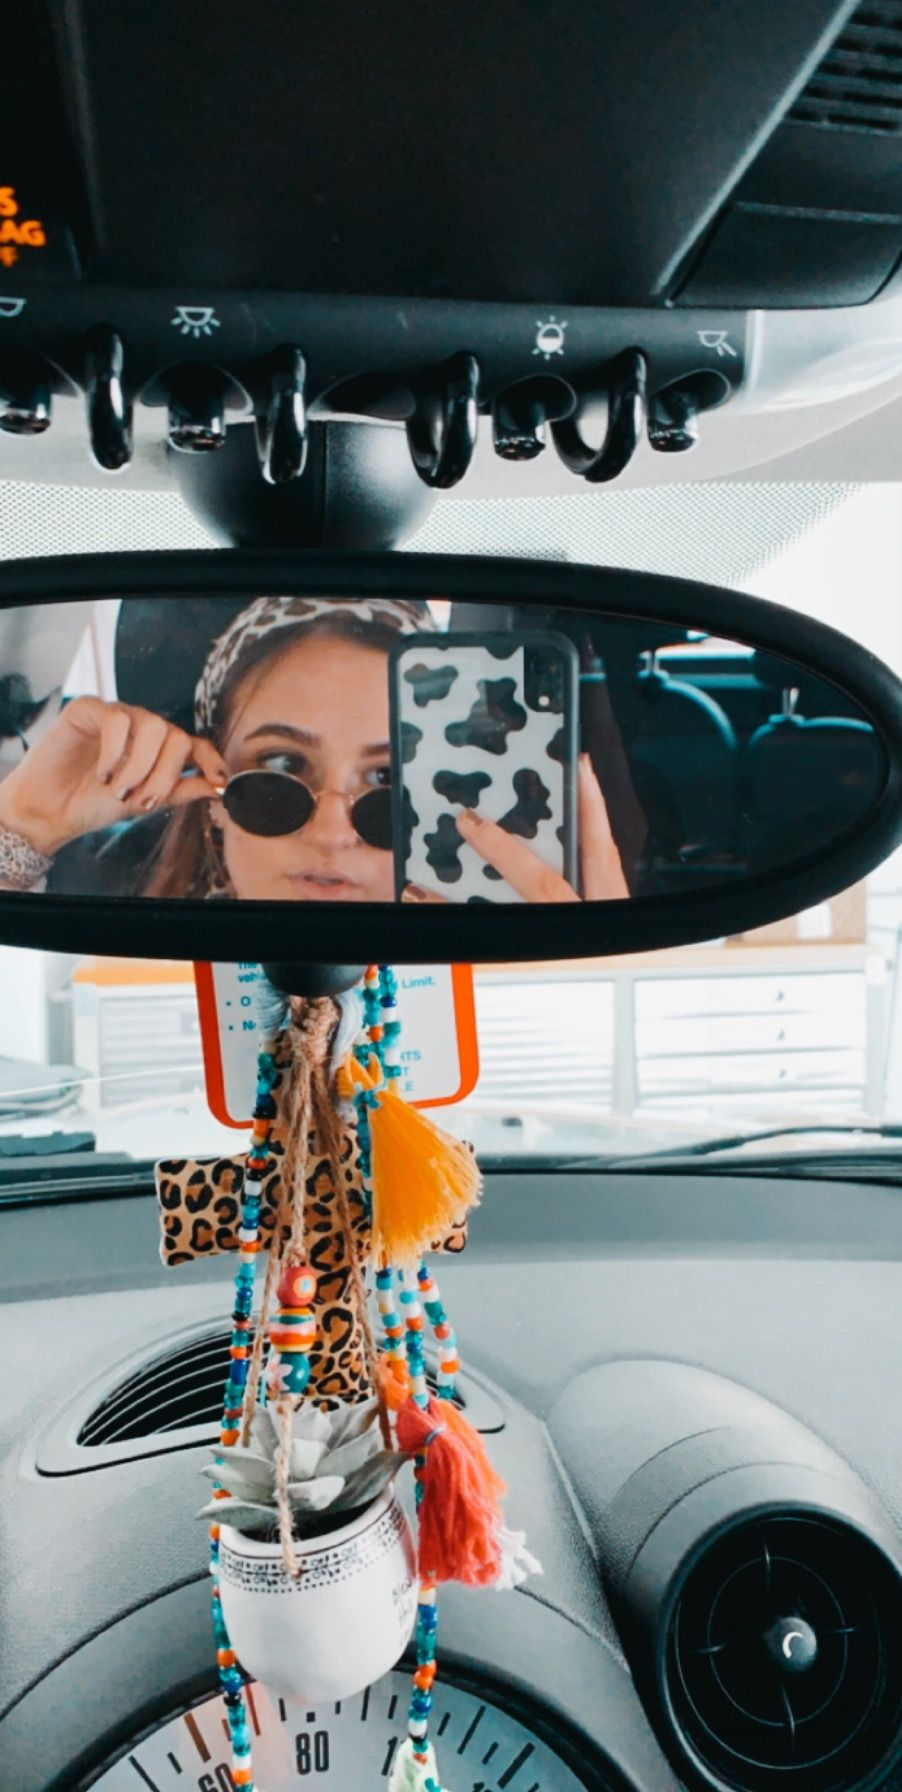 meet ec272 4ebb5 Car mirror selfie, cheetah headband, Rayban sunglasses, wildflower ...